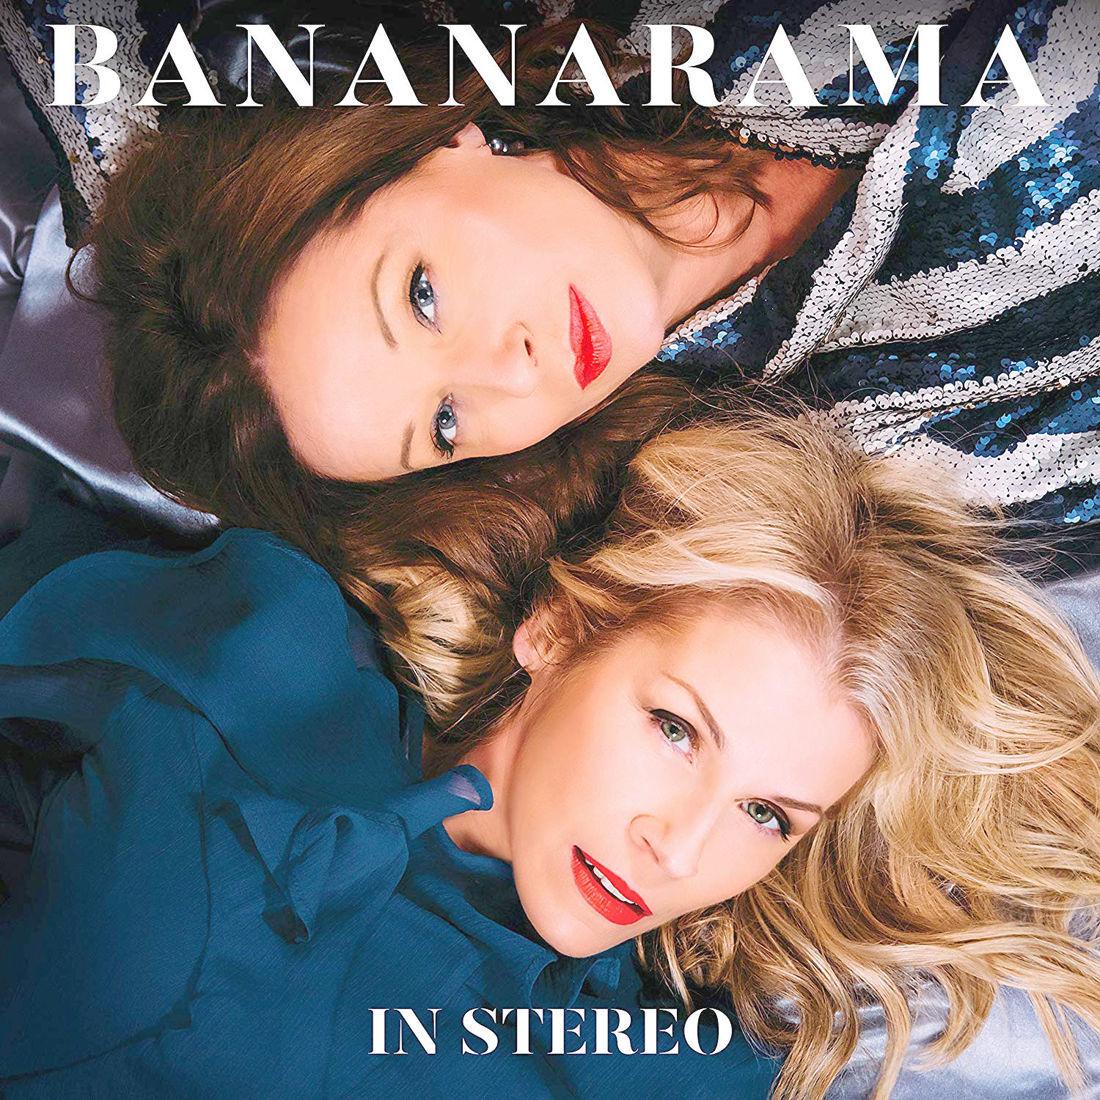 Music review: Bananarama - 'In Stereo'